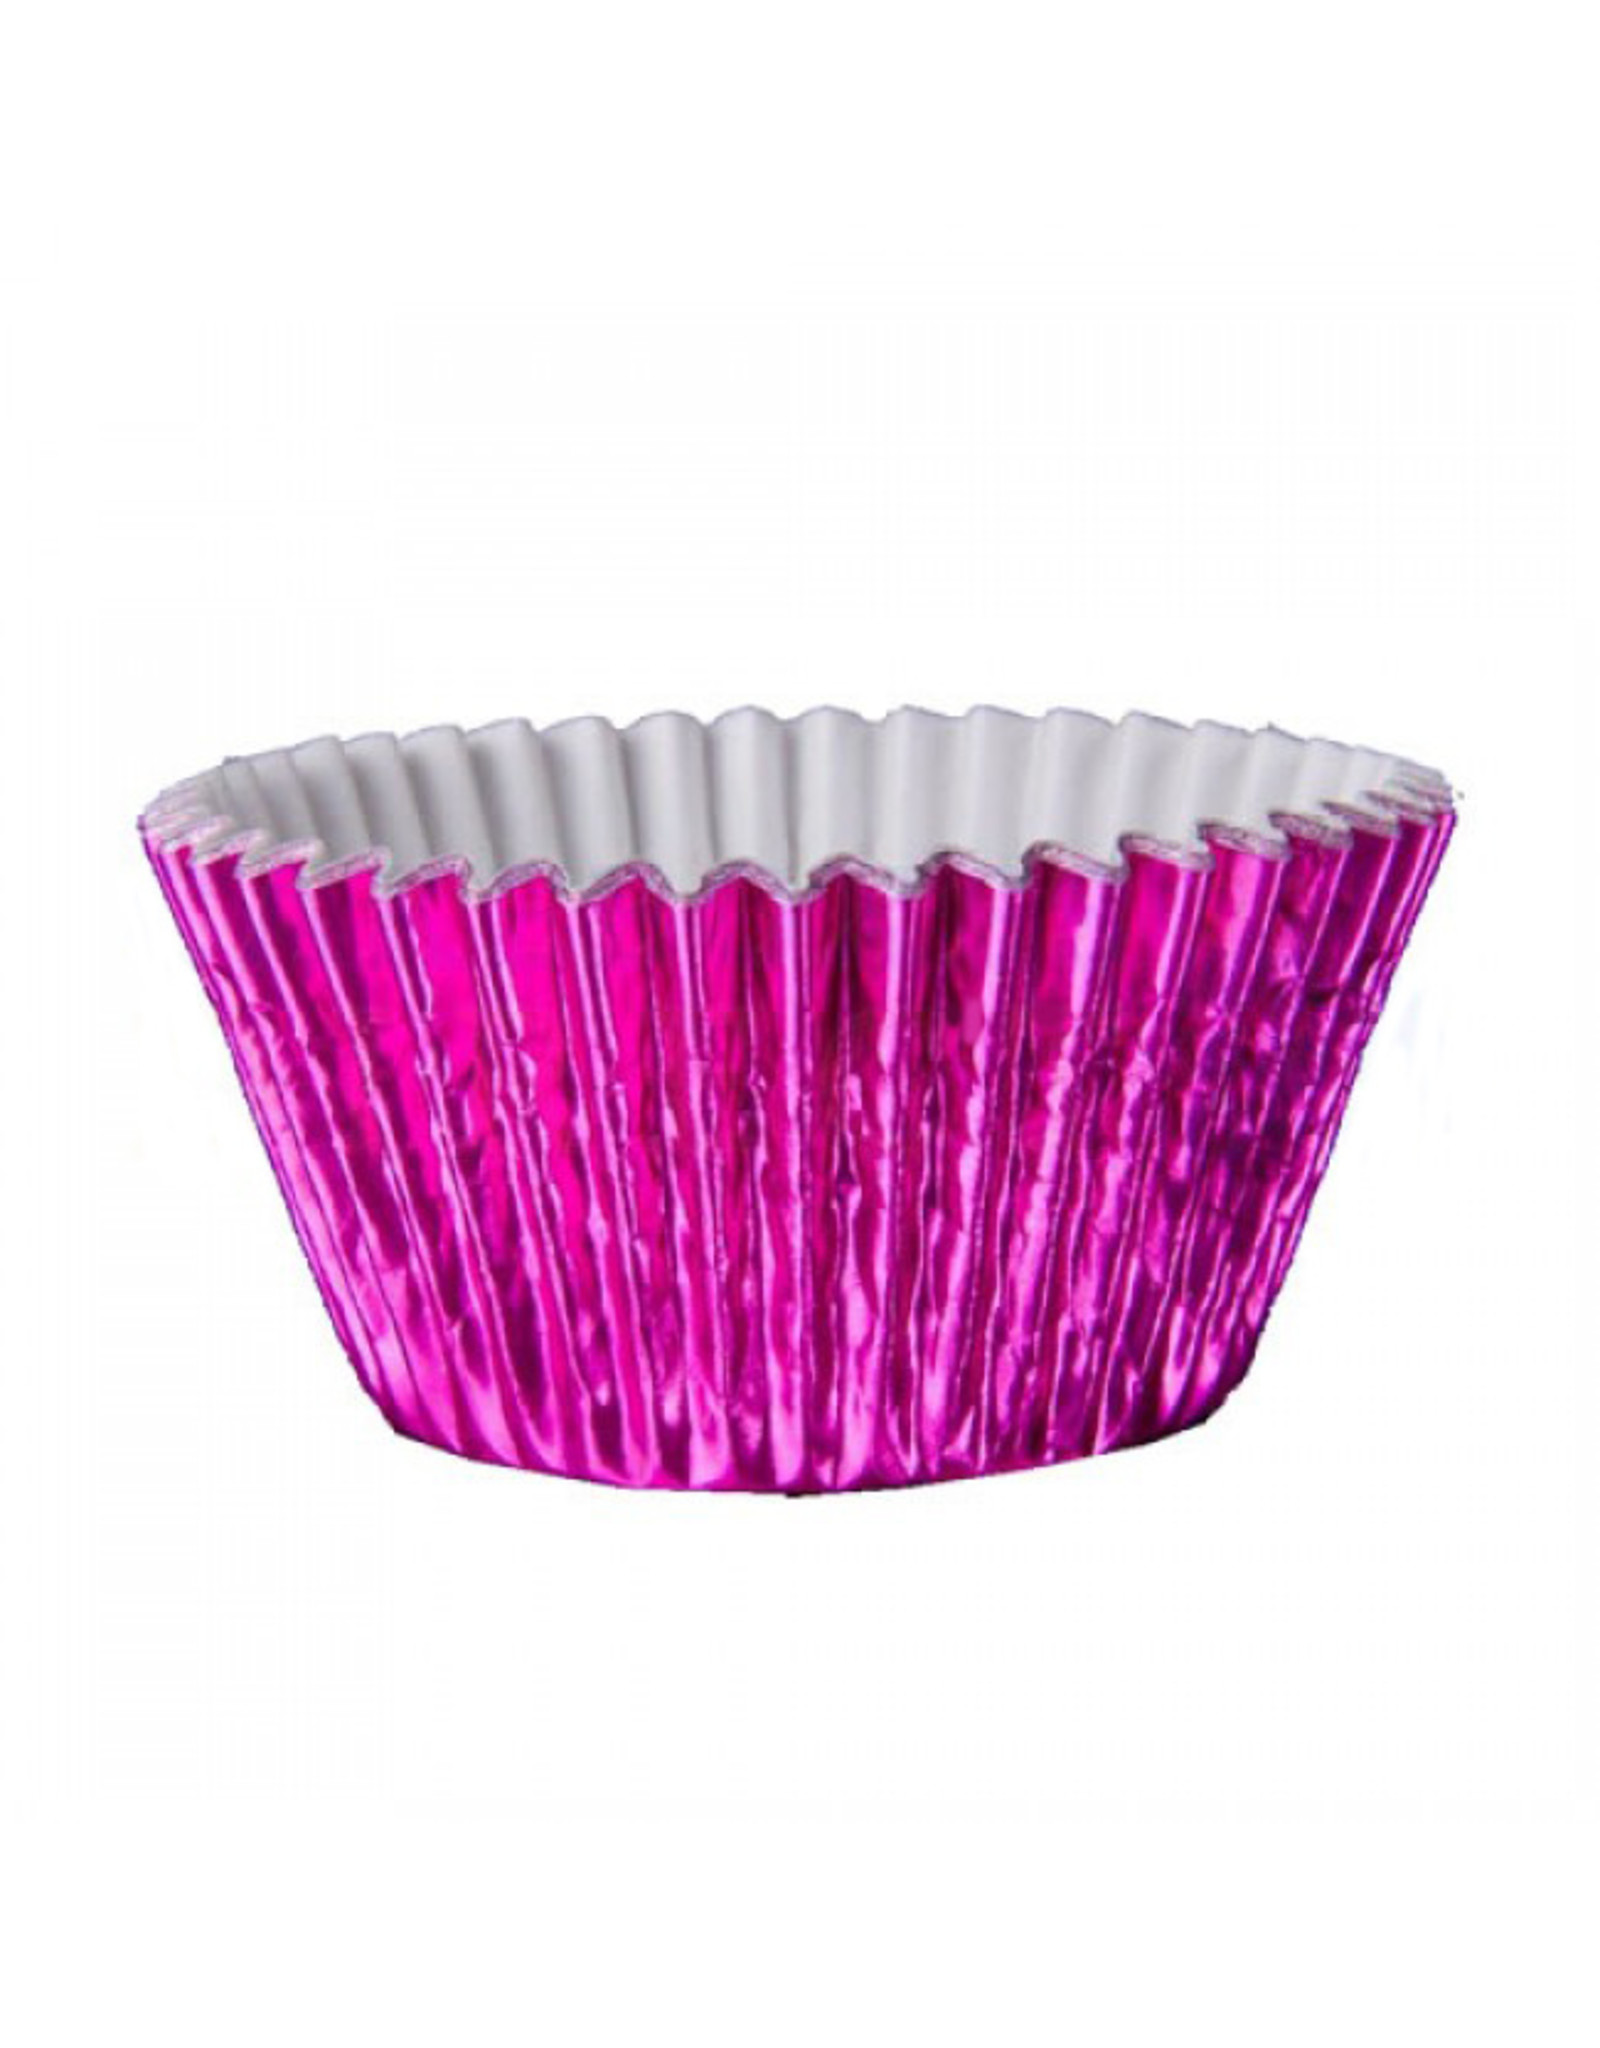 Metallic baking cups - hot pink (500 pieces)